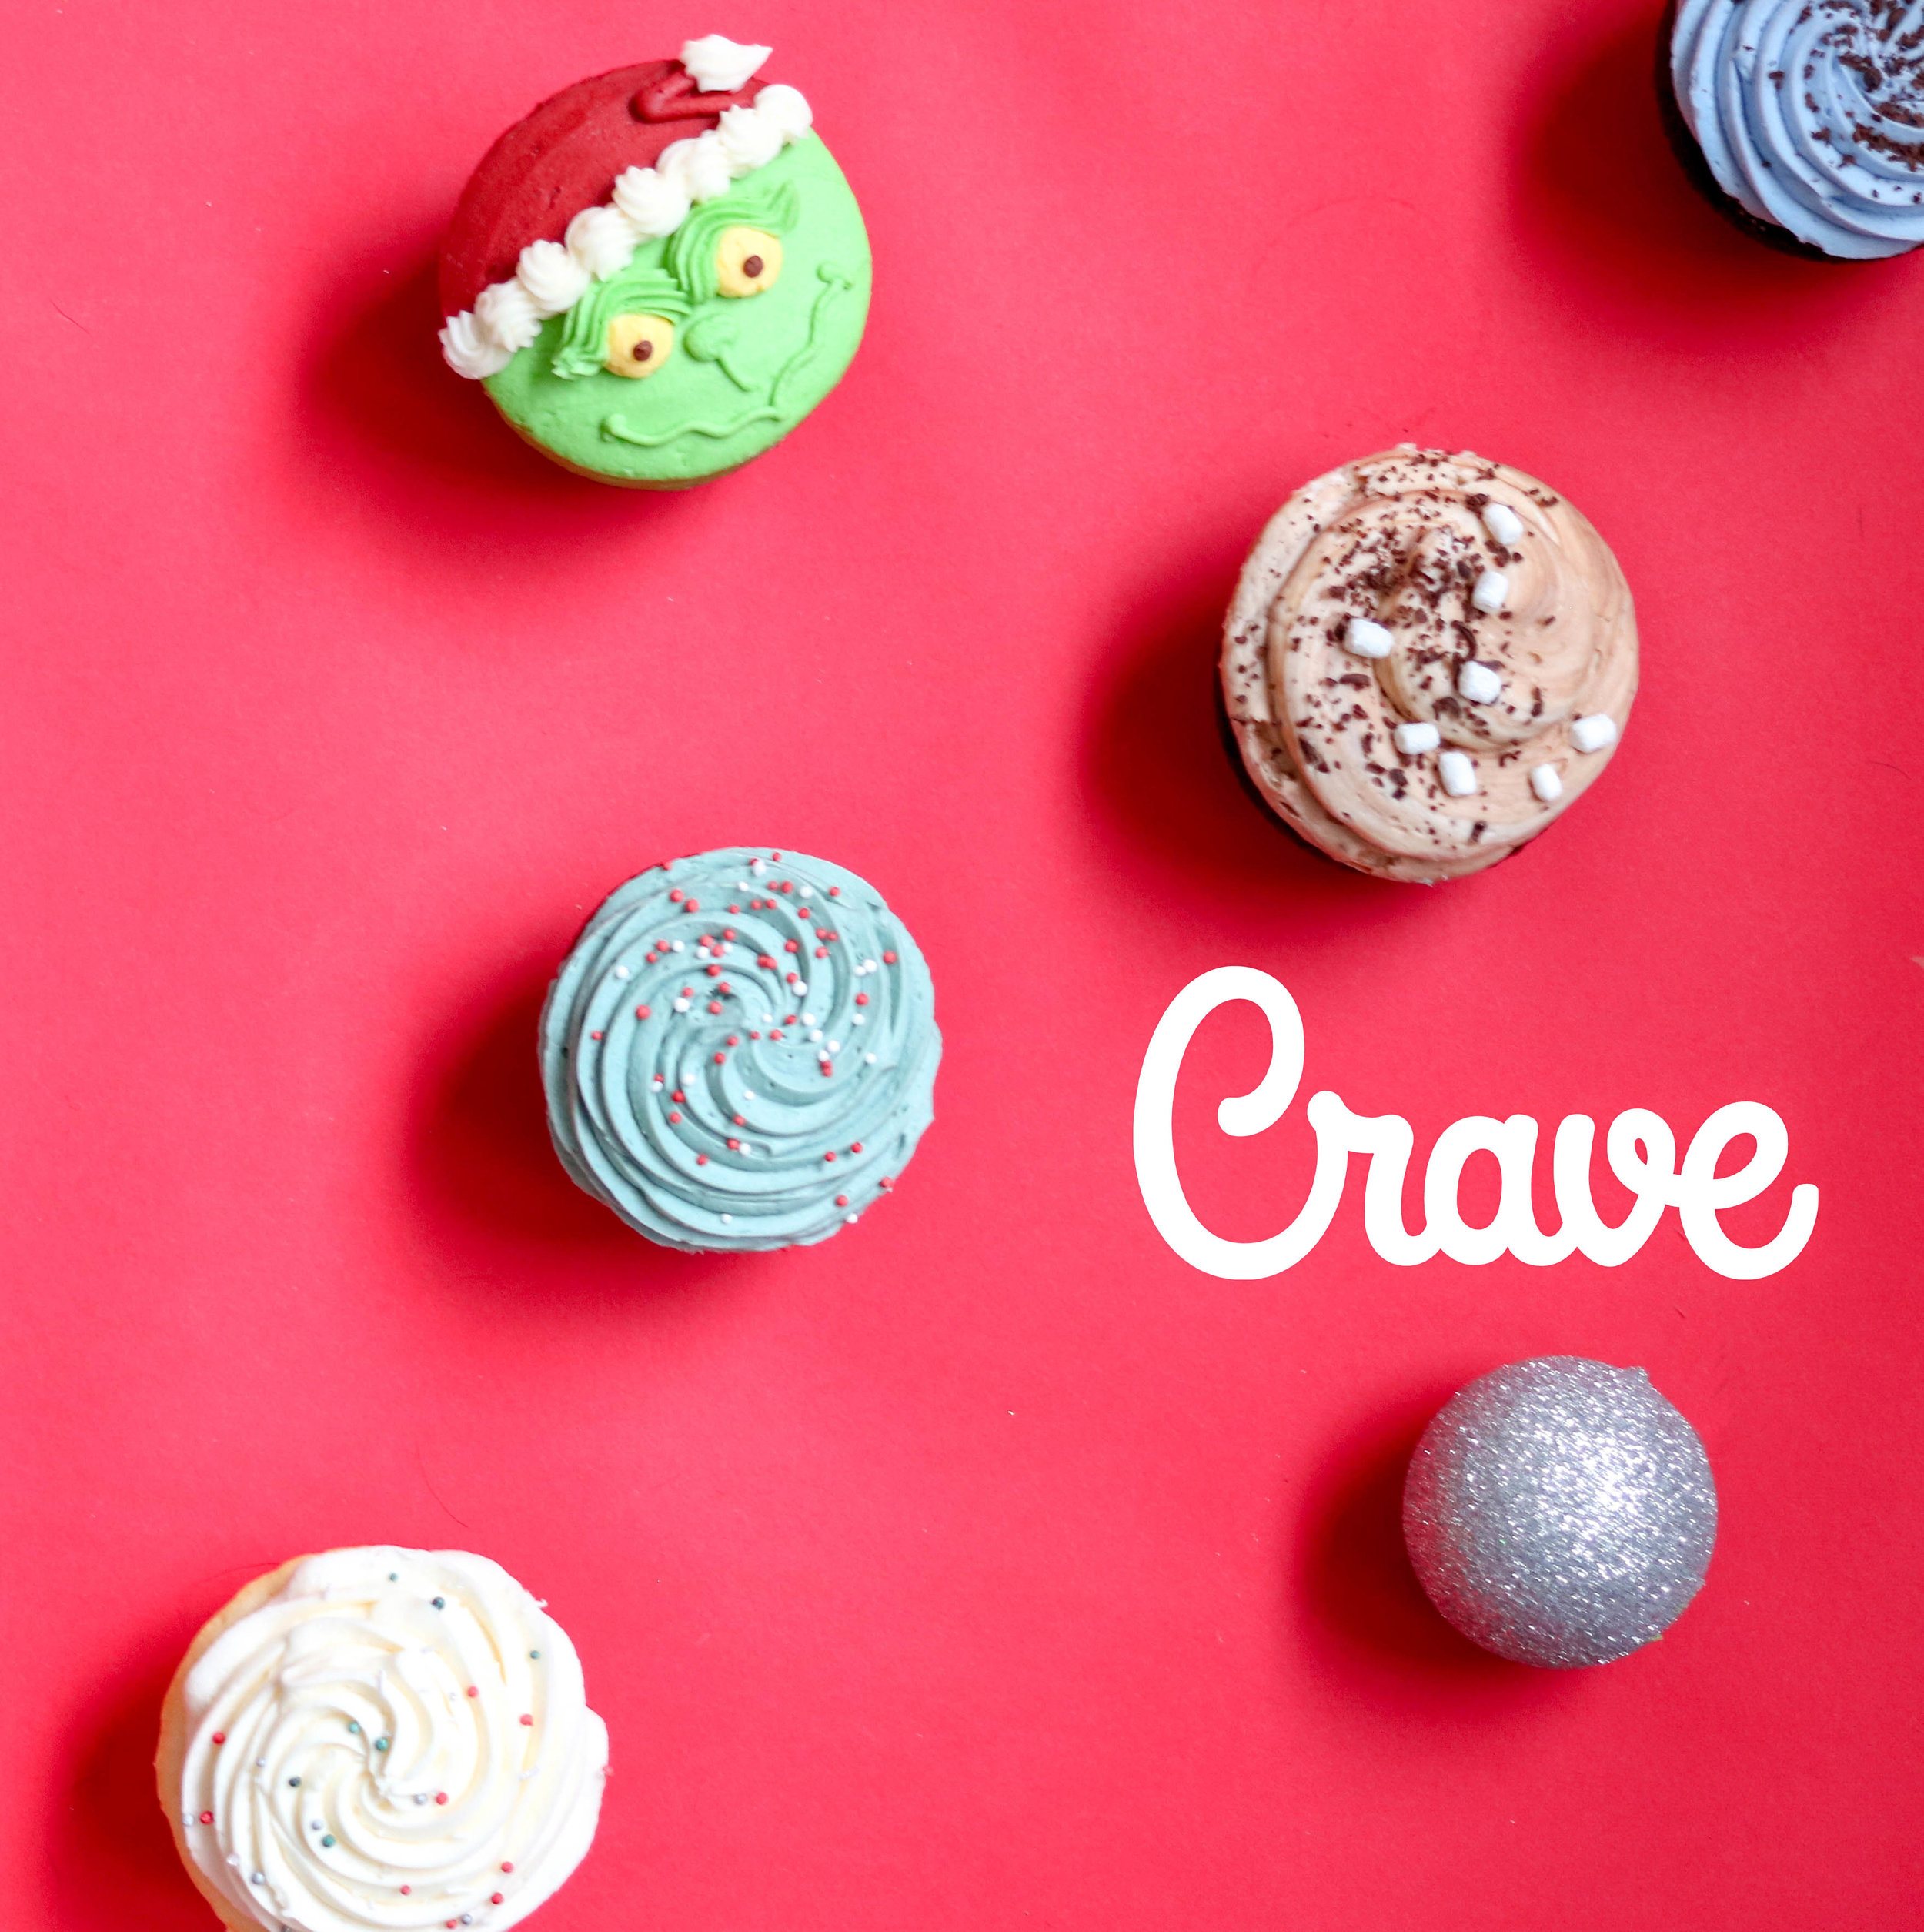 1. Crave Cupcakeslogo.jpg